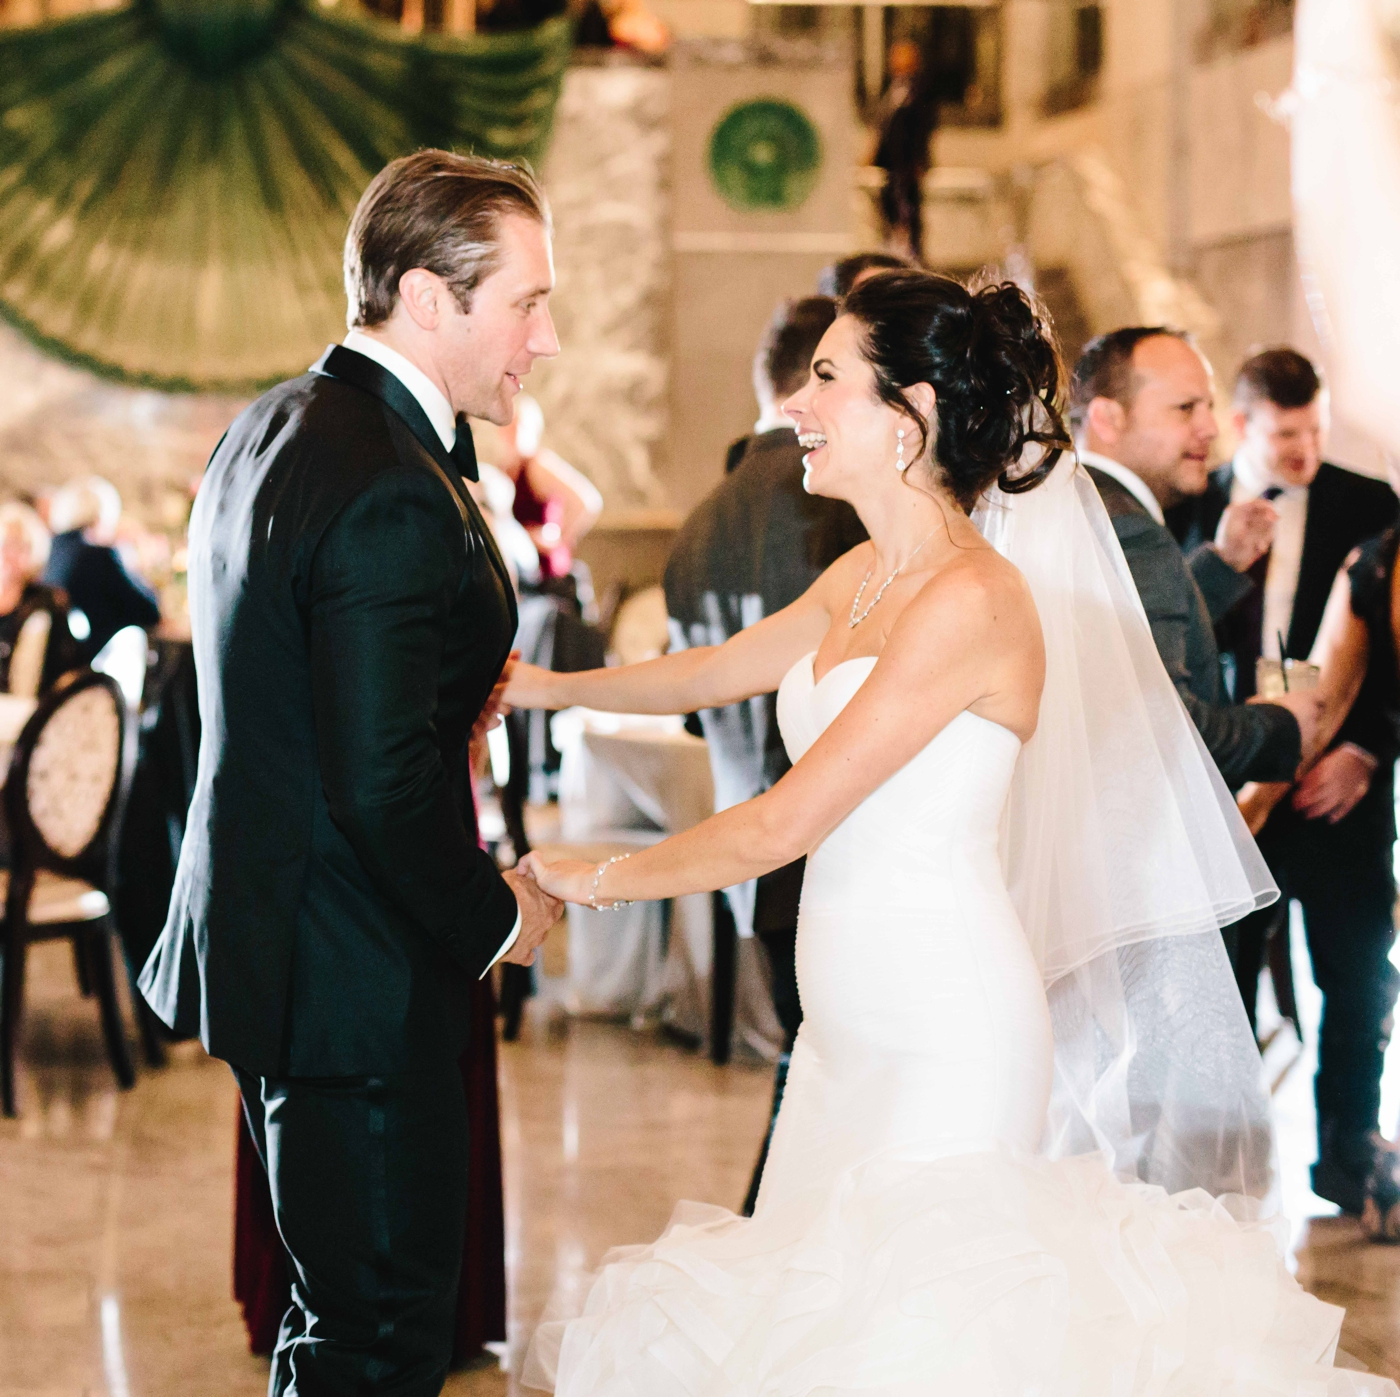 chicago-fine-art-wedding-photography-hamm69